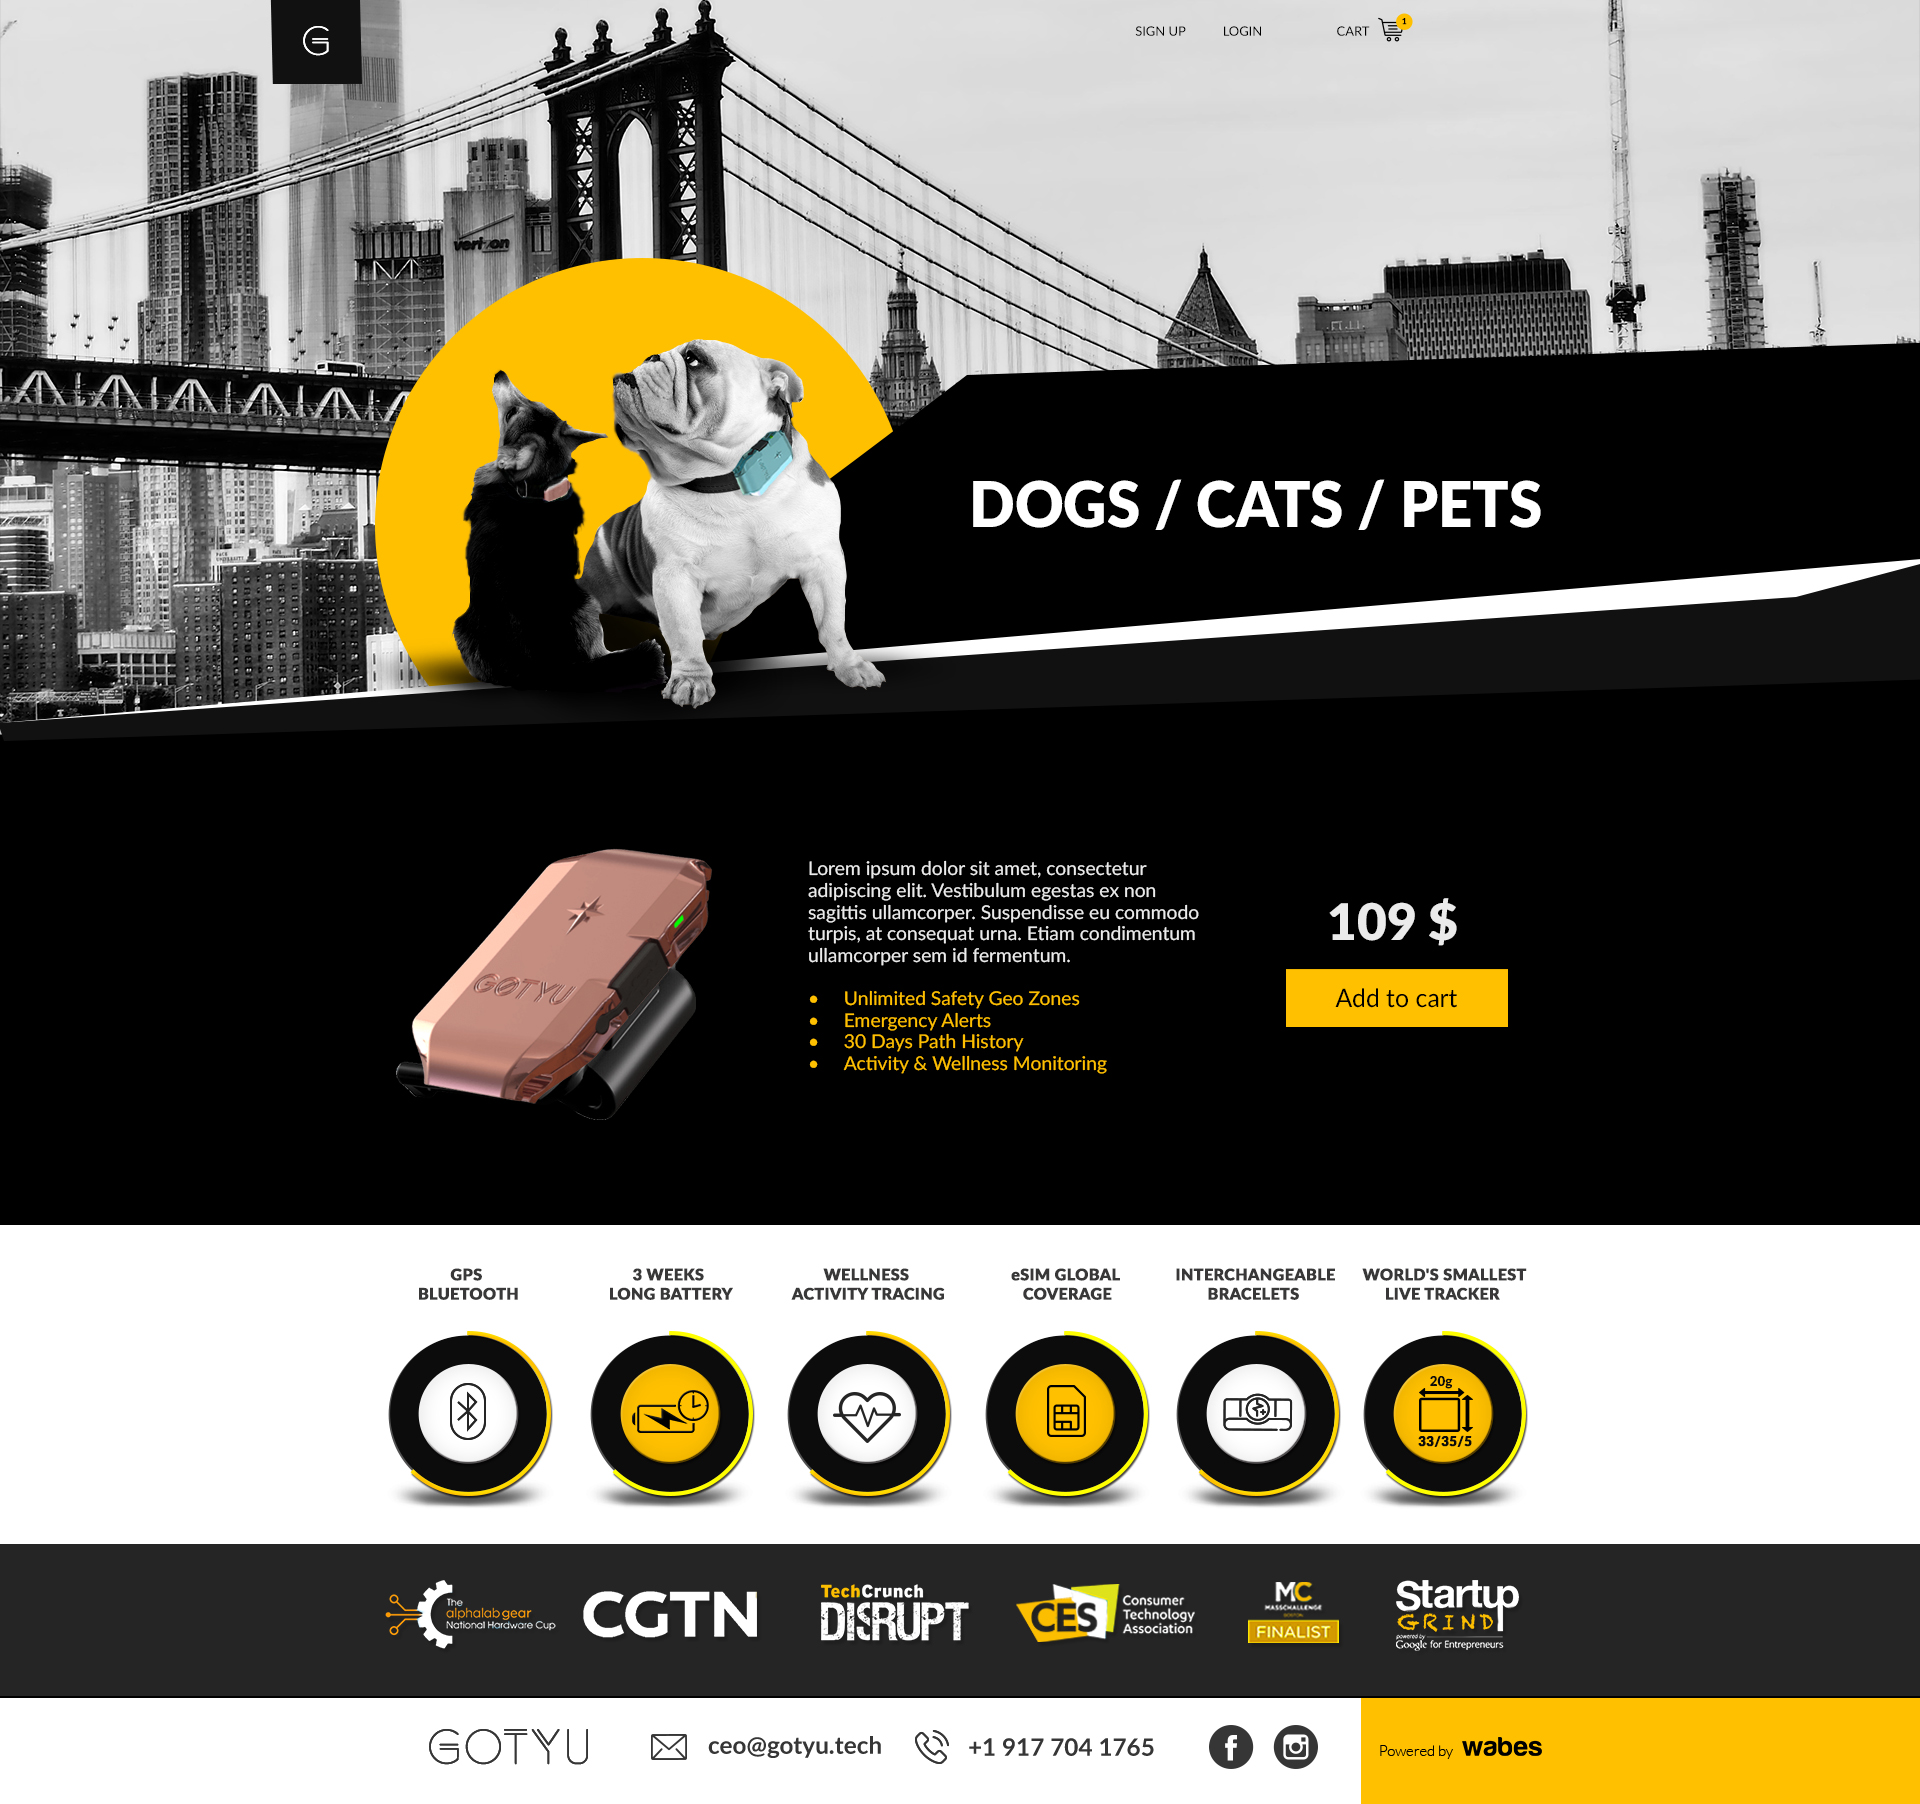 1 Dogs Cats Pets - Gotyu